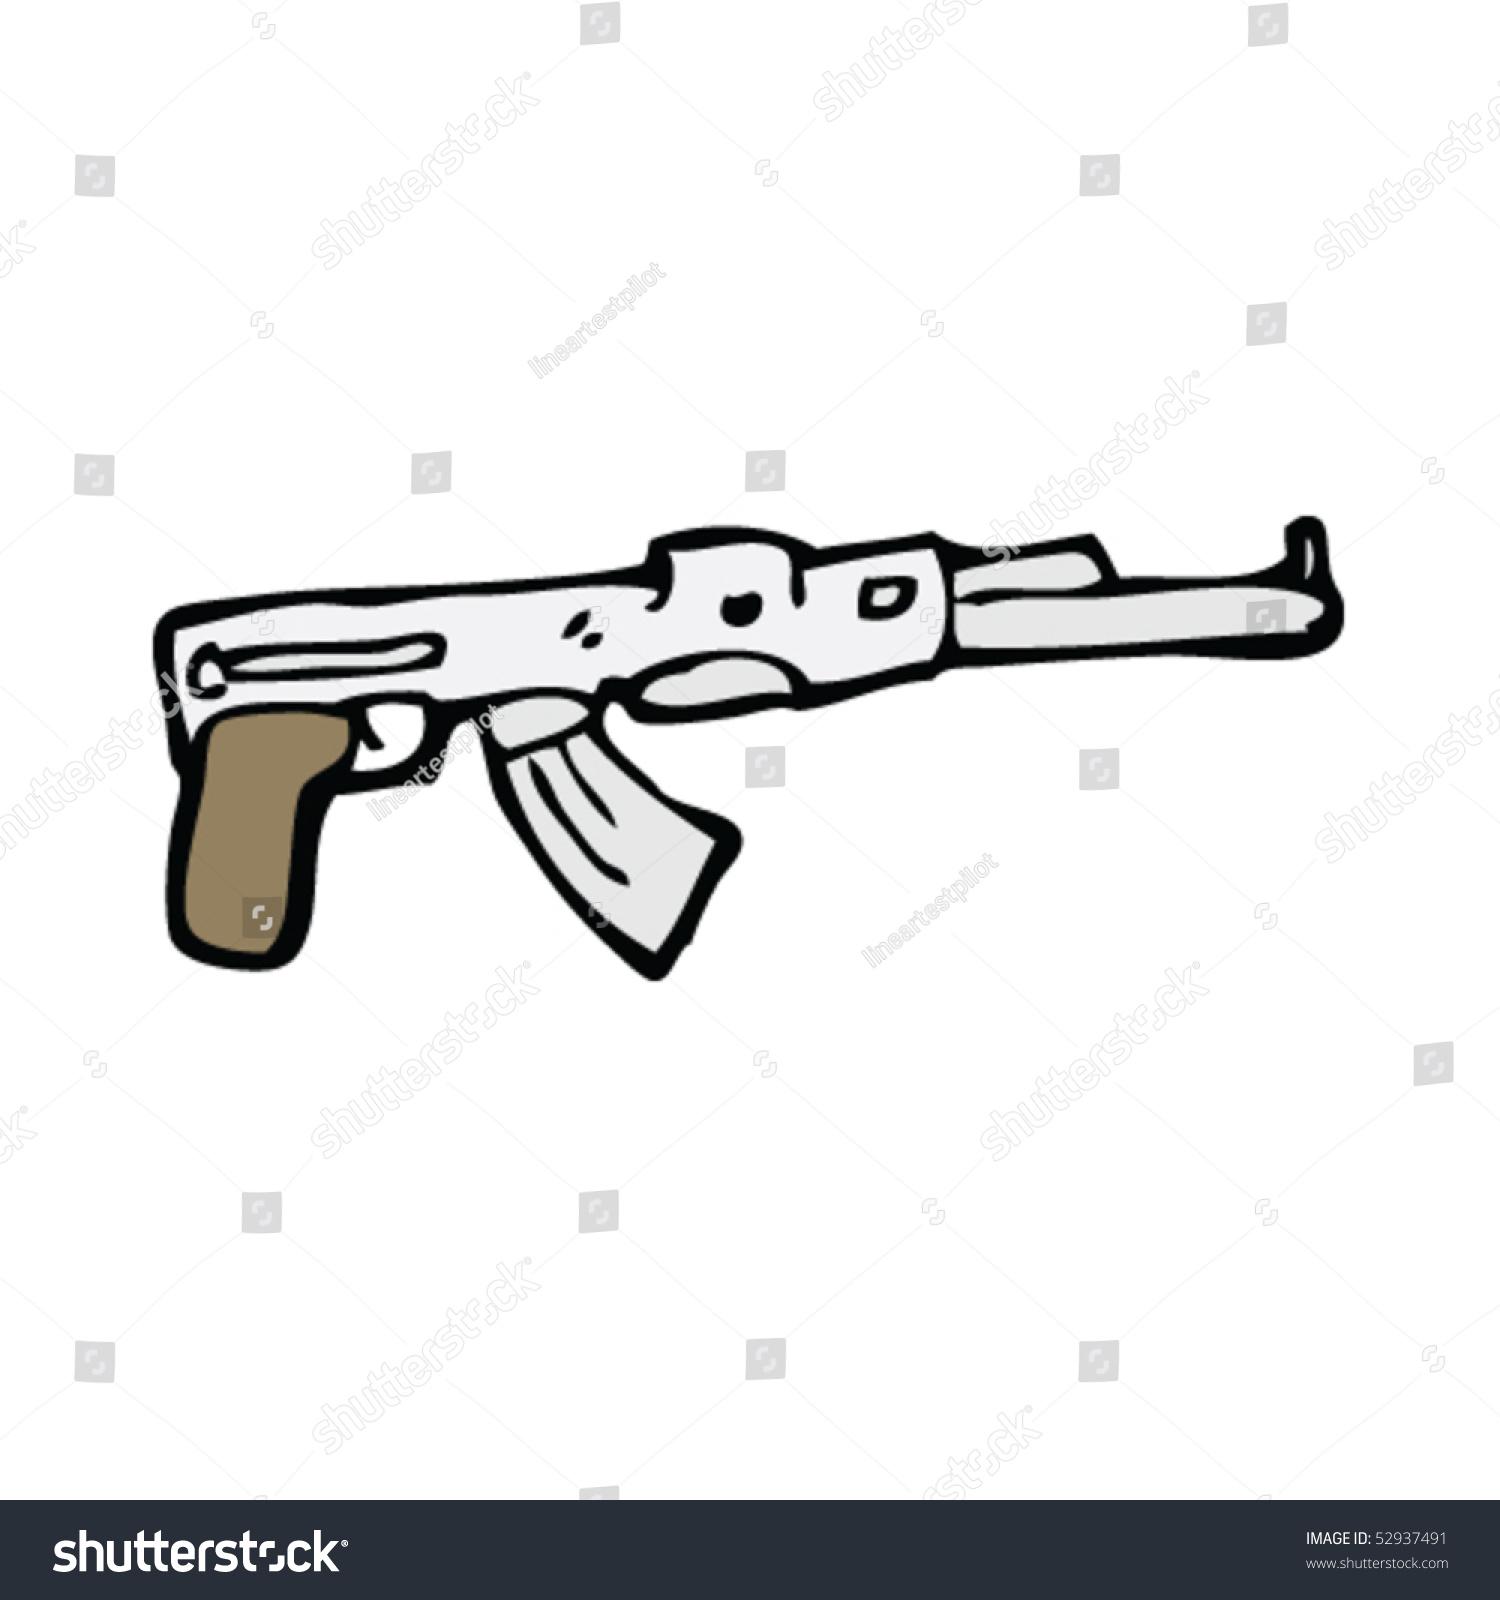 Machine Gun Drawing Stock Vector 52937491 : Shutterstock